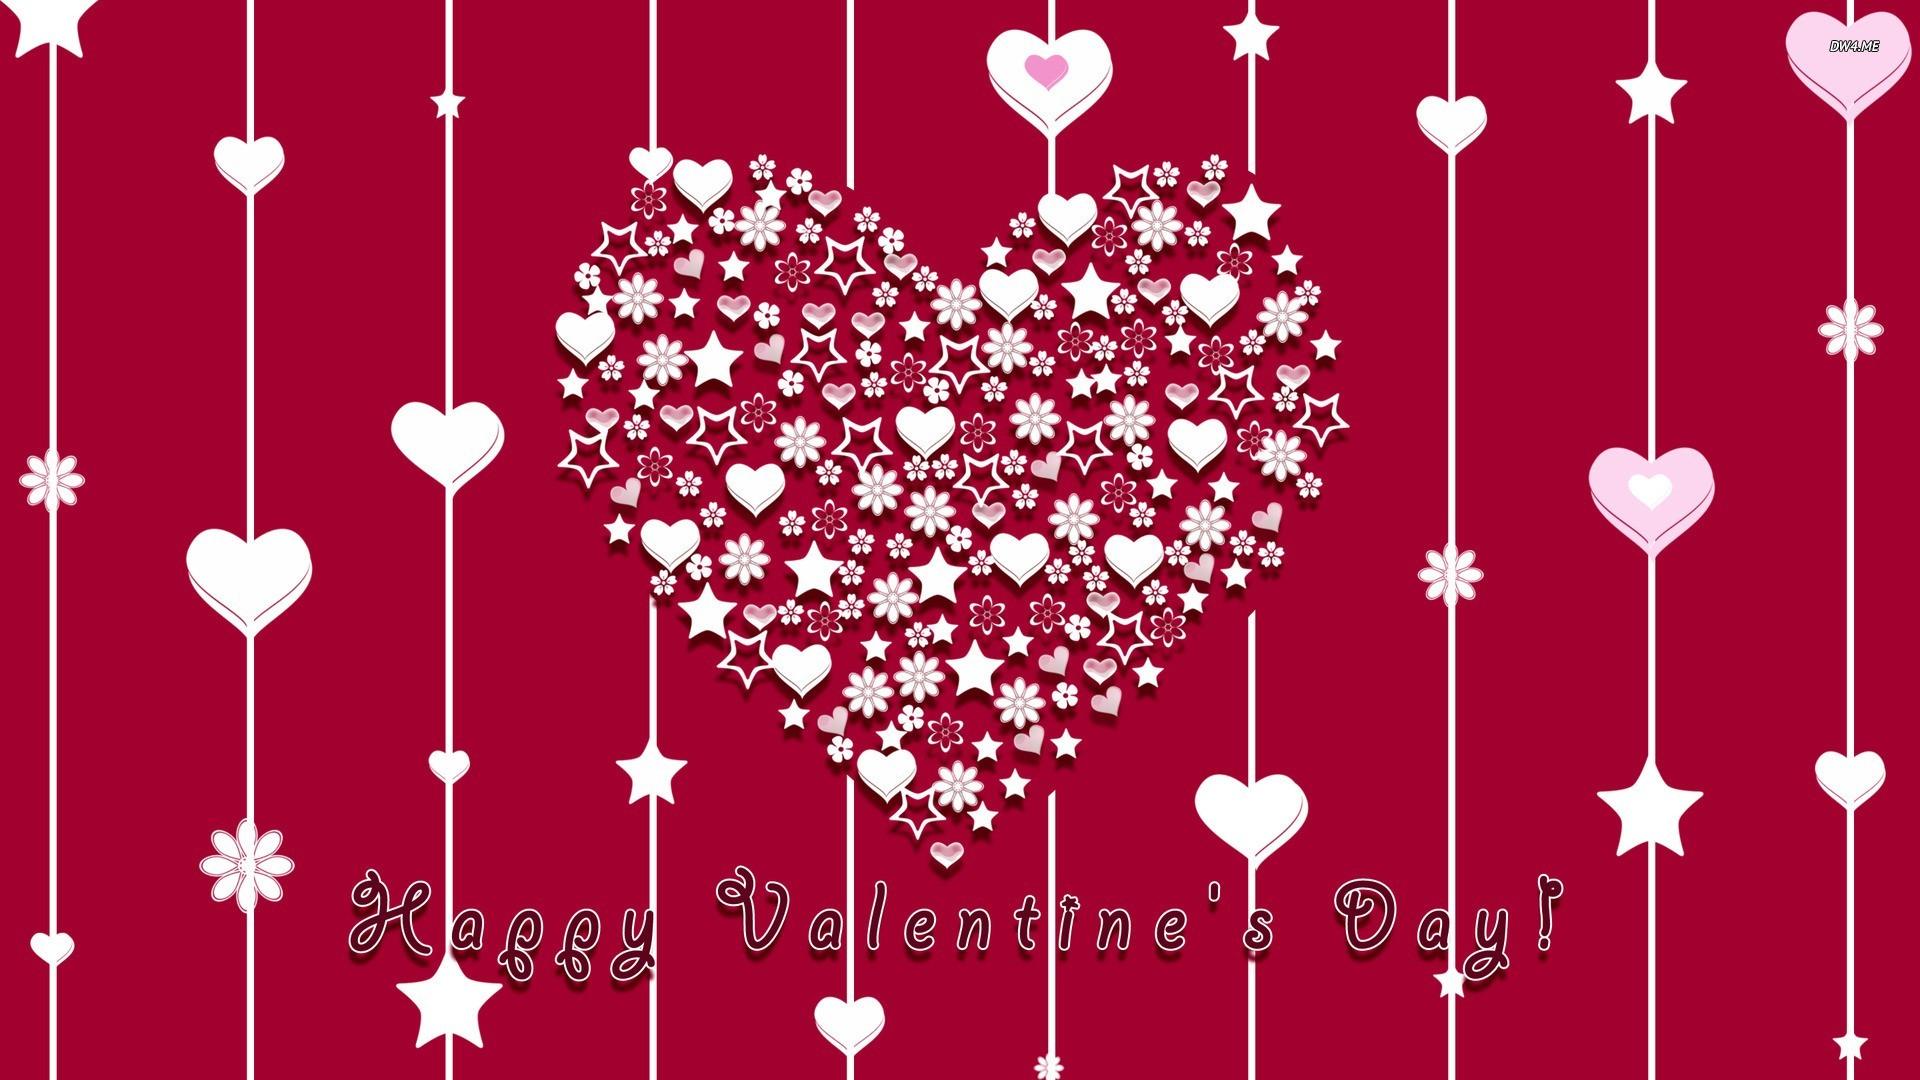 Download Valentine Heart HD Wallpaper